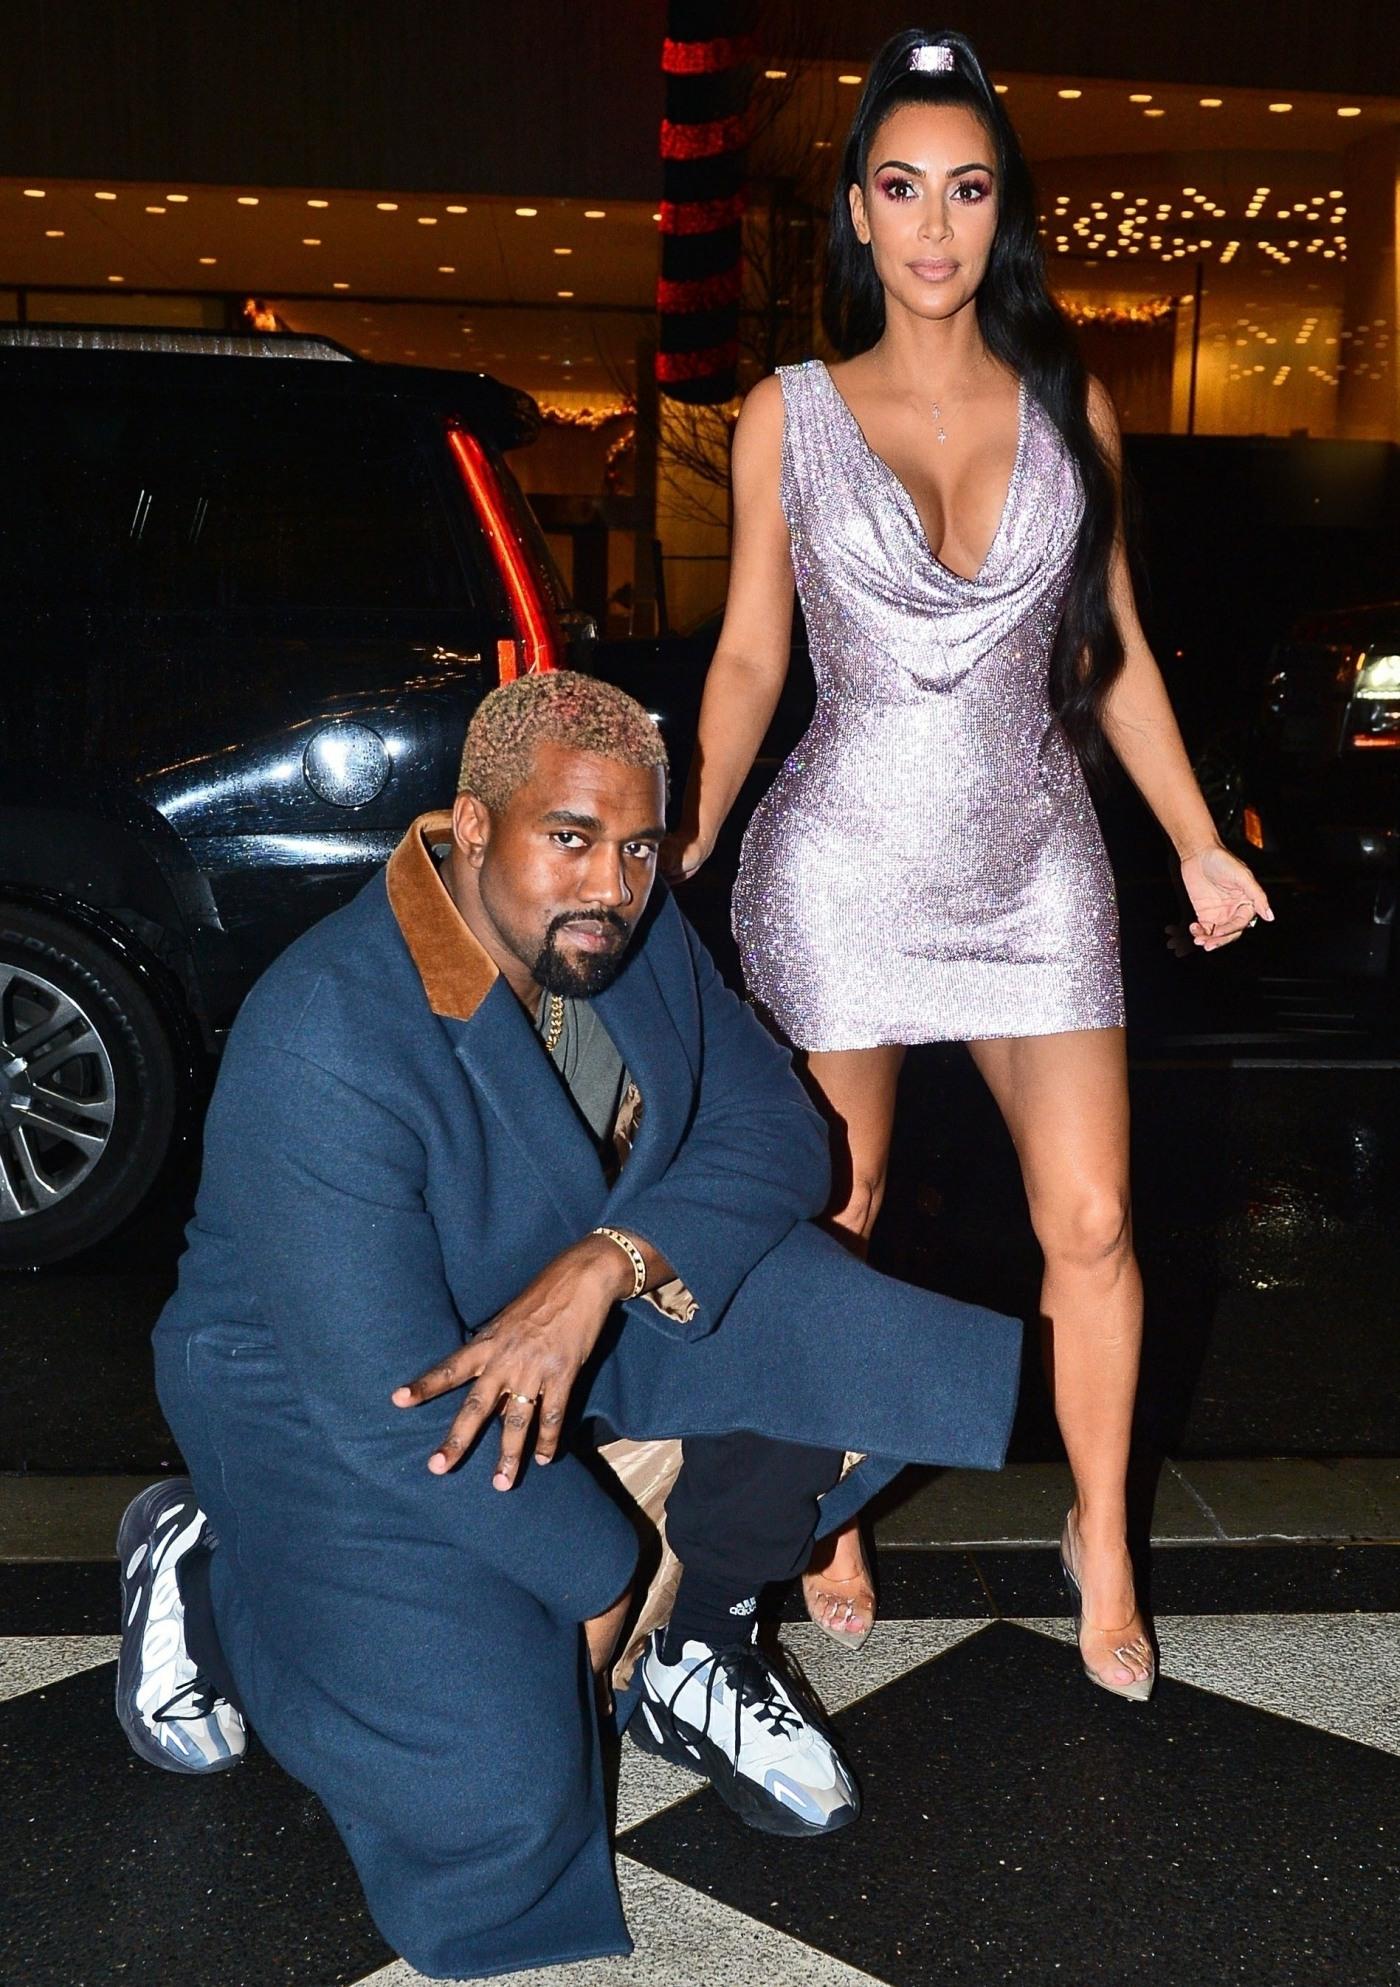 Kim Kardashian & Diane Kruger brought their men to the NYC Versace show